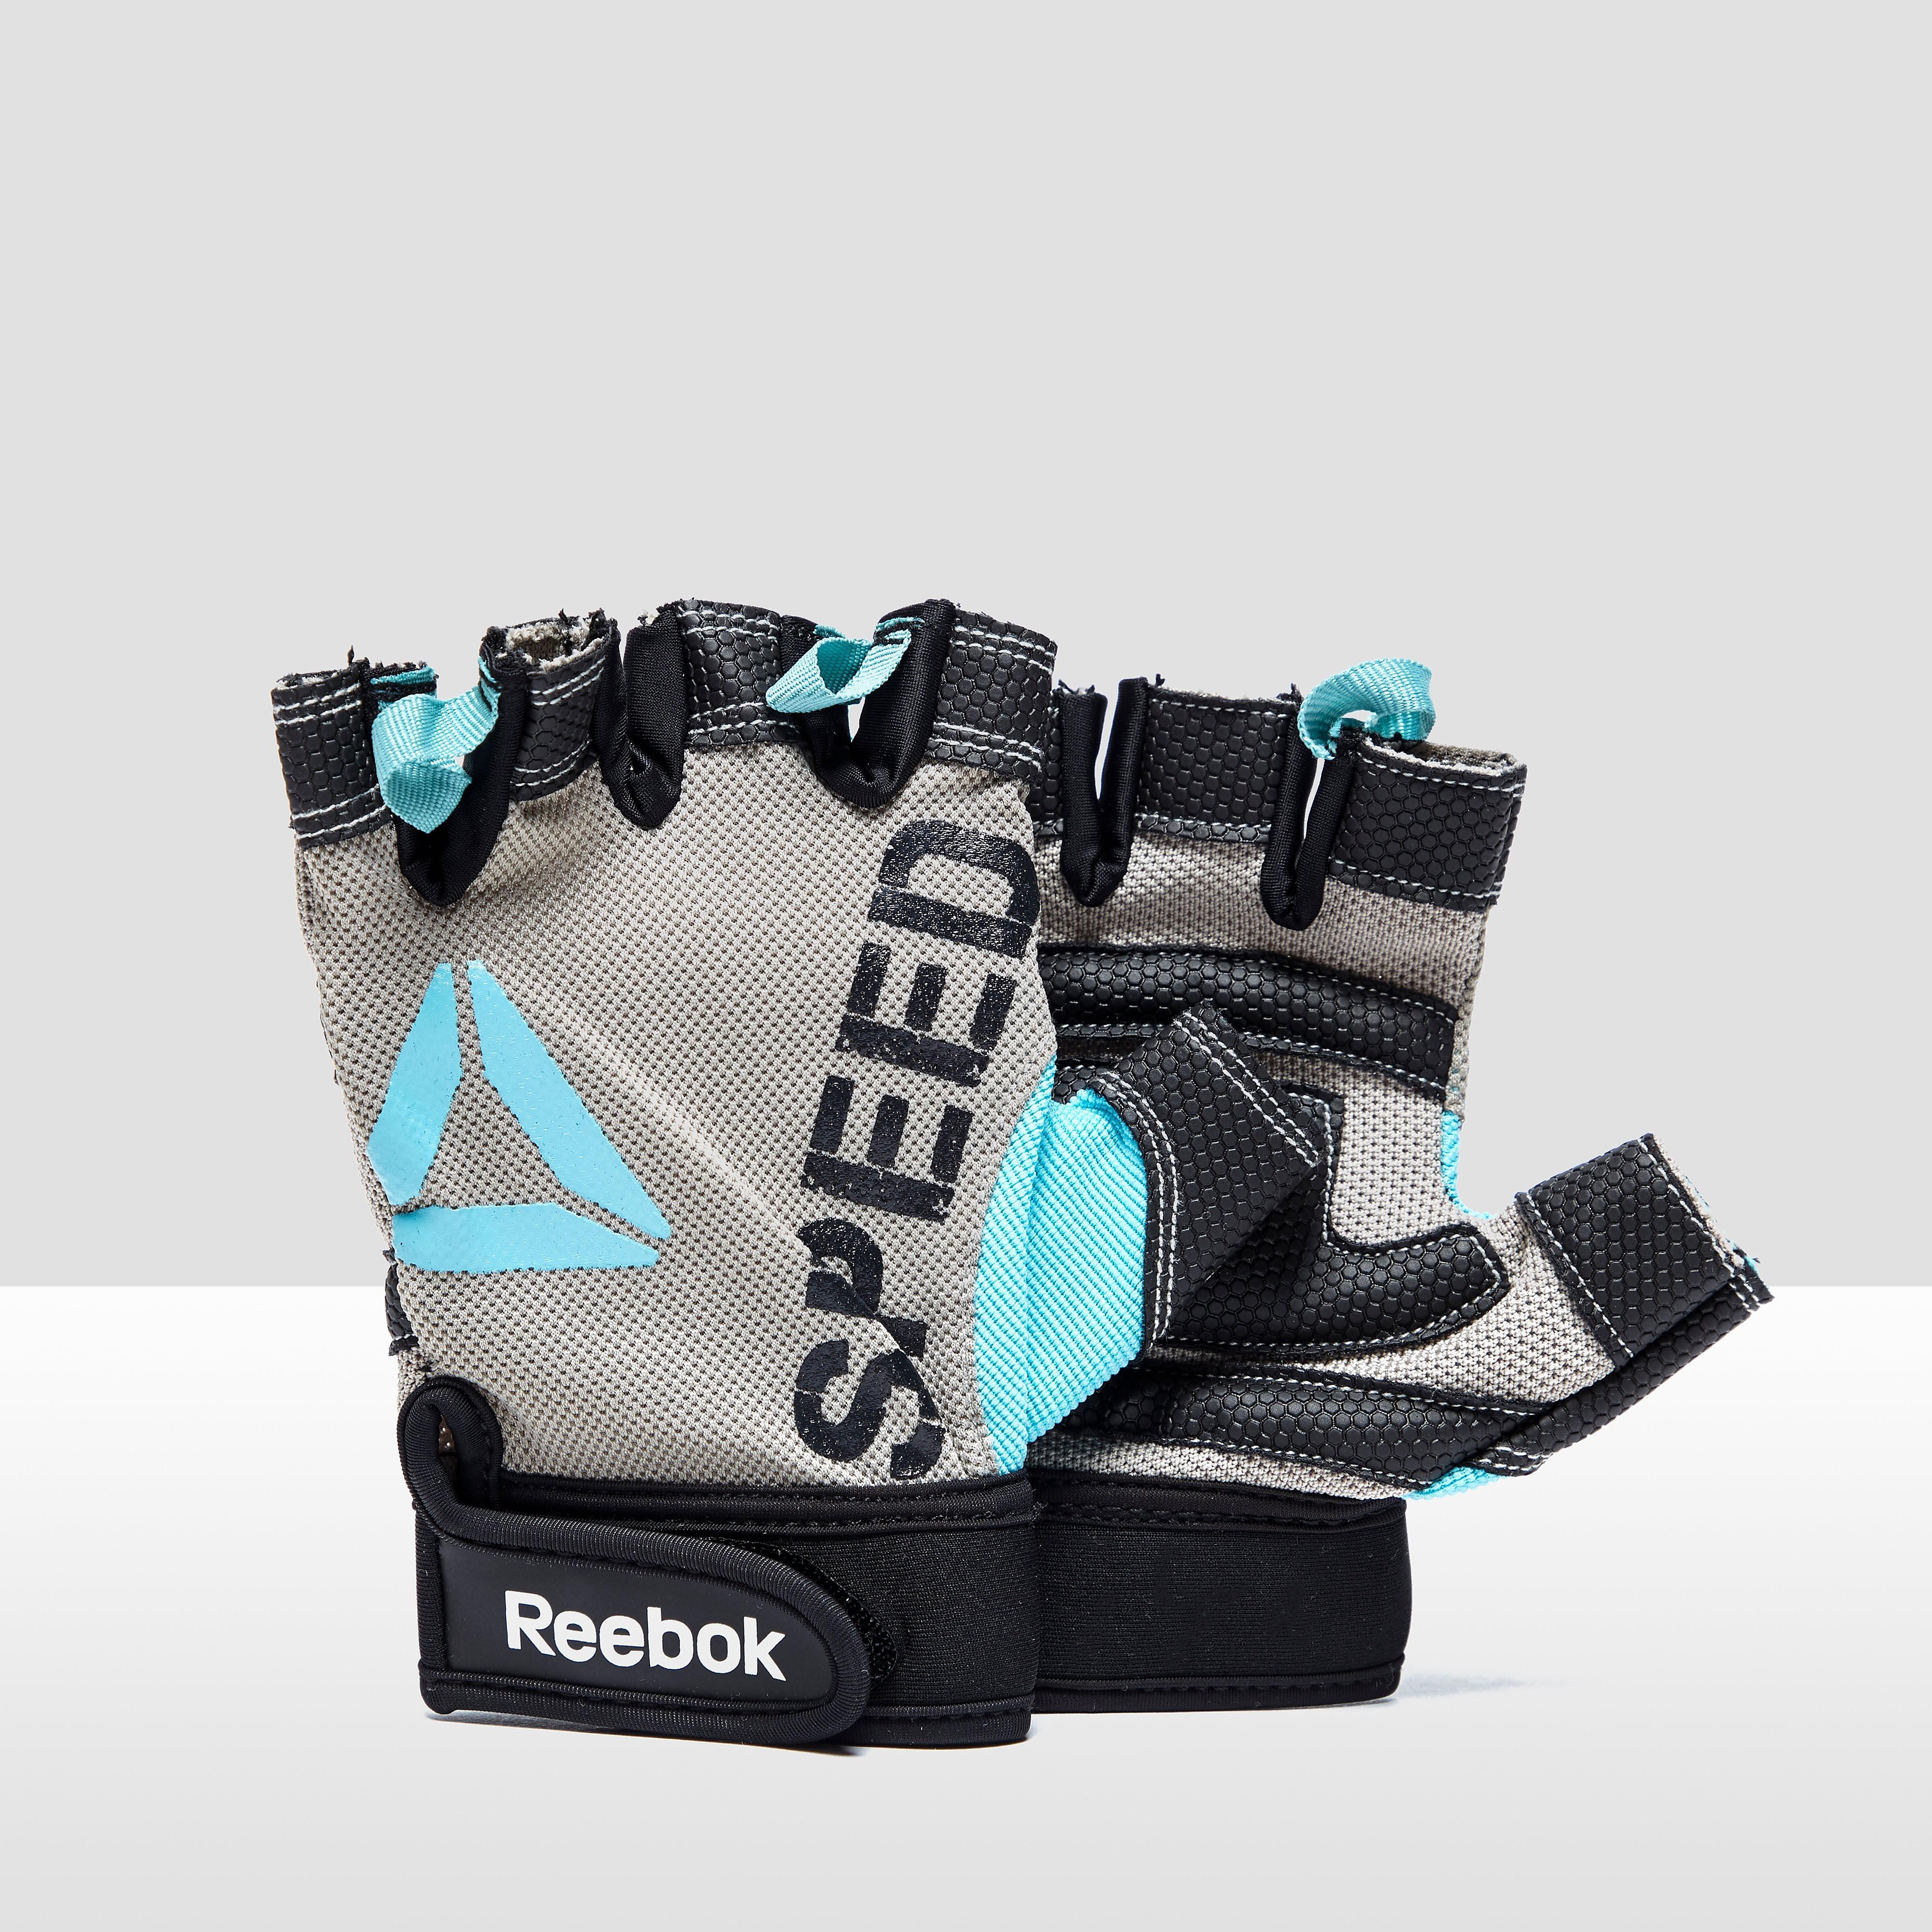 Reebok Women's Training Speed Gloves